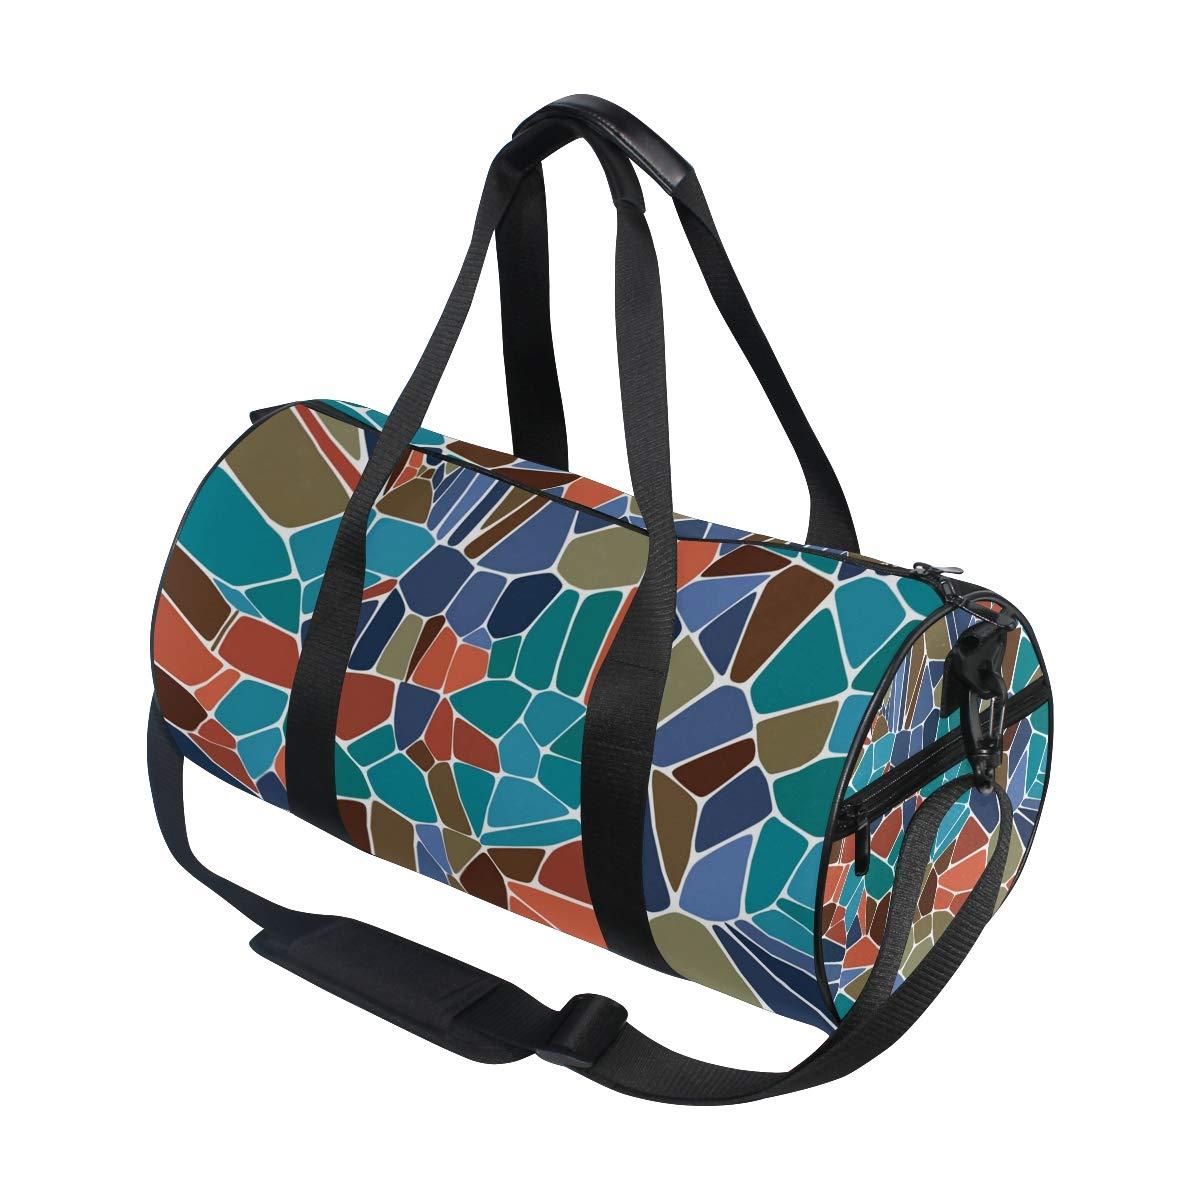 Split Silent Ceramic PictureWaterproof Non-Slip Wearable Crossbody Bag fitness bag Shoulder Bag